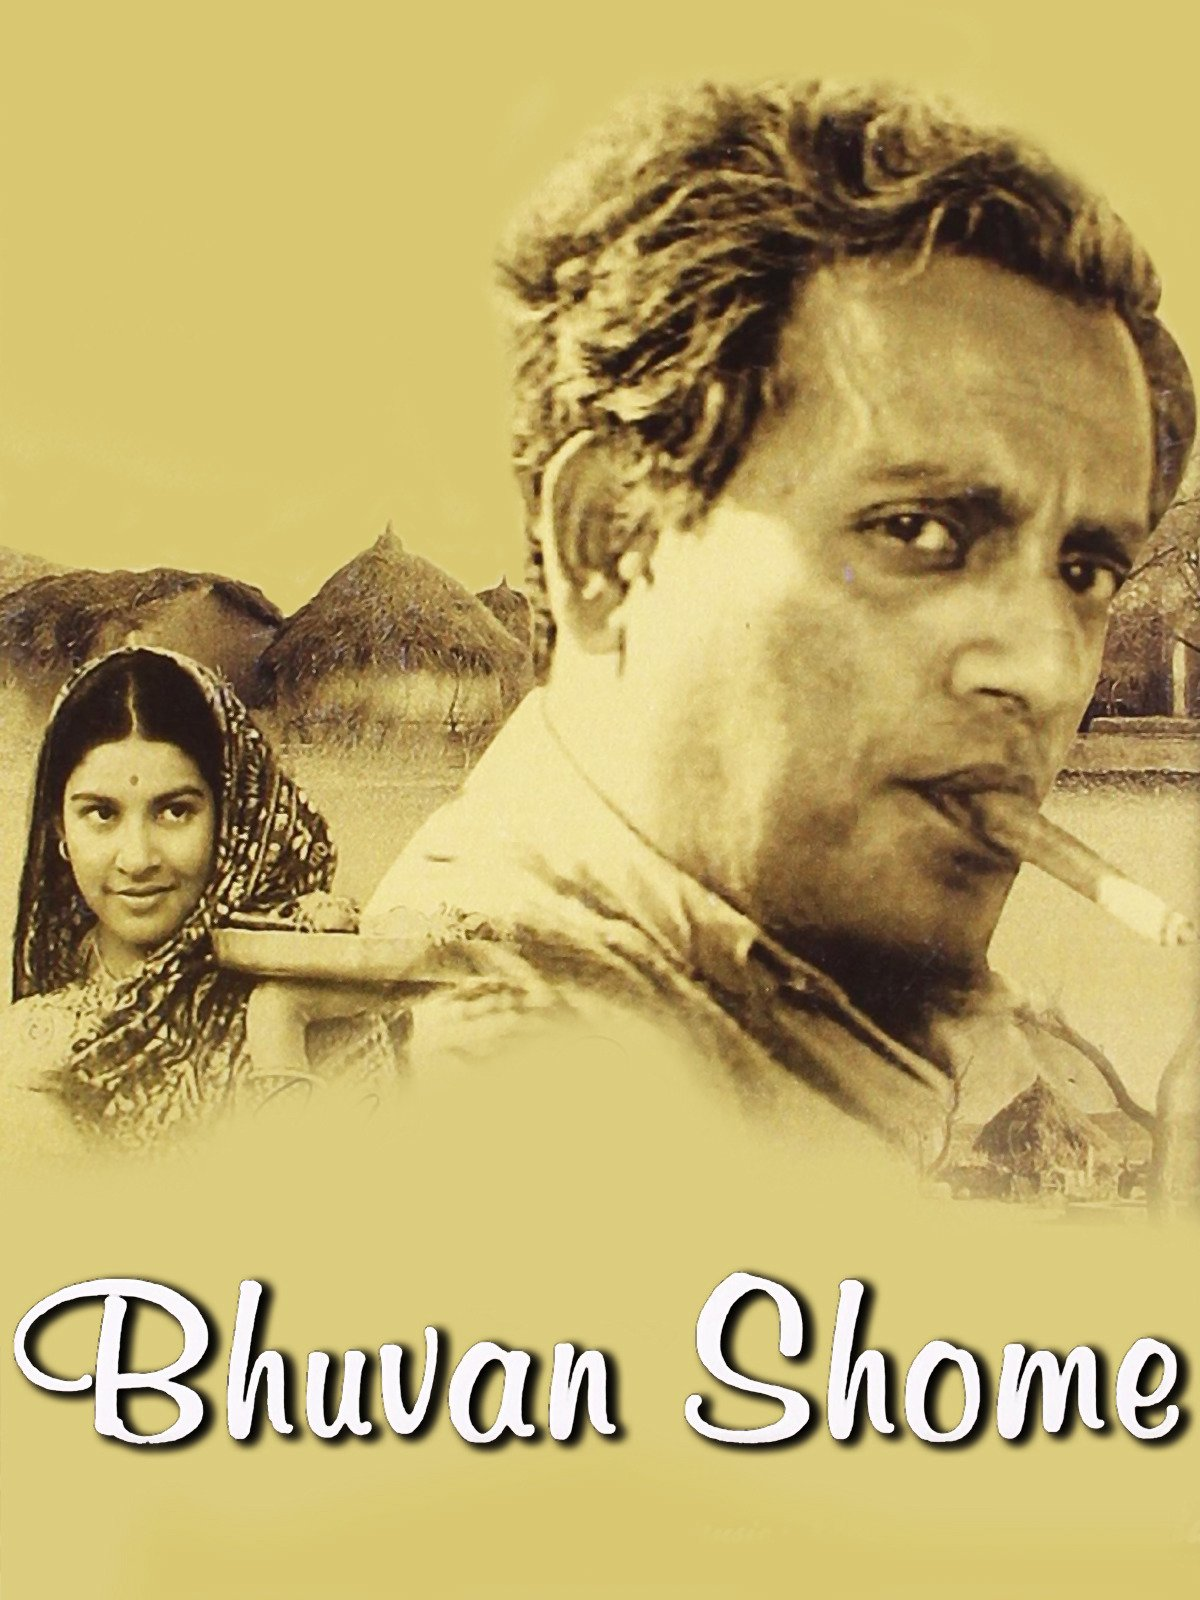 Amazon.com: Watch Bhuvan Shome | Prime Video